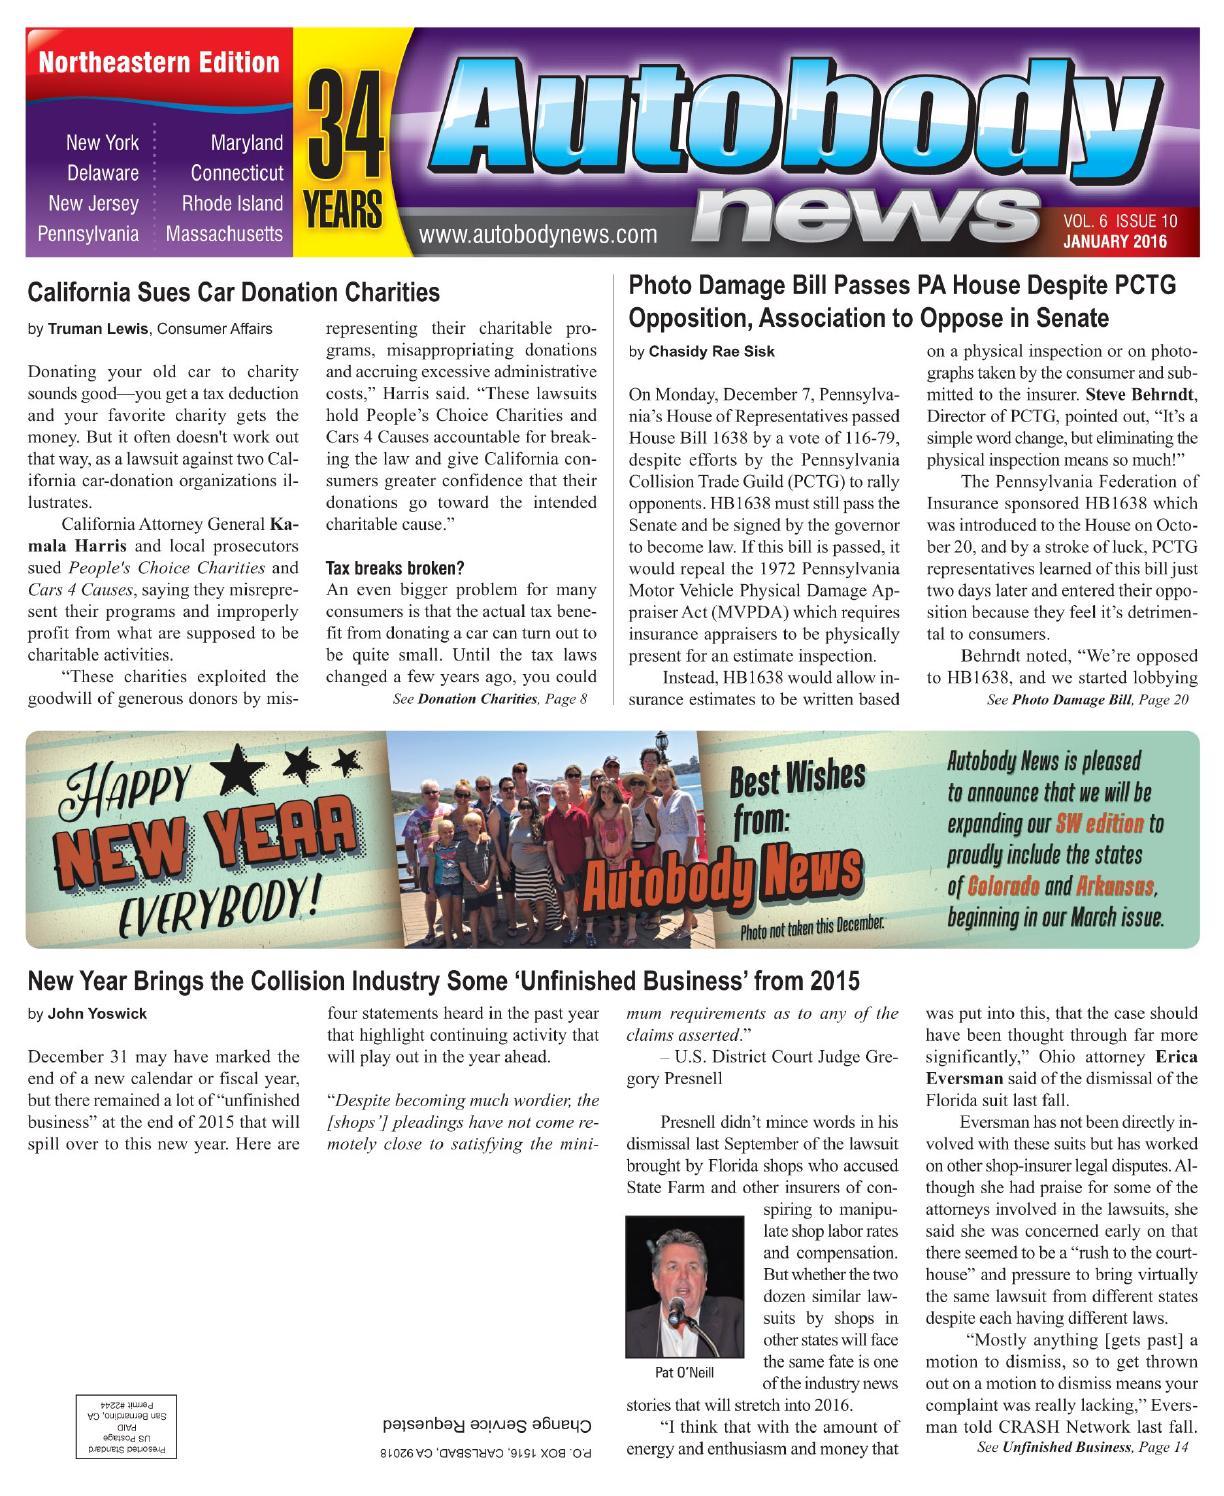 Northeastern January 2015 Issue by Autobody News - issuu